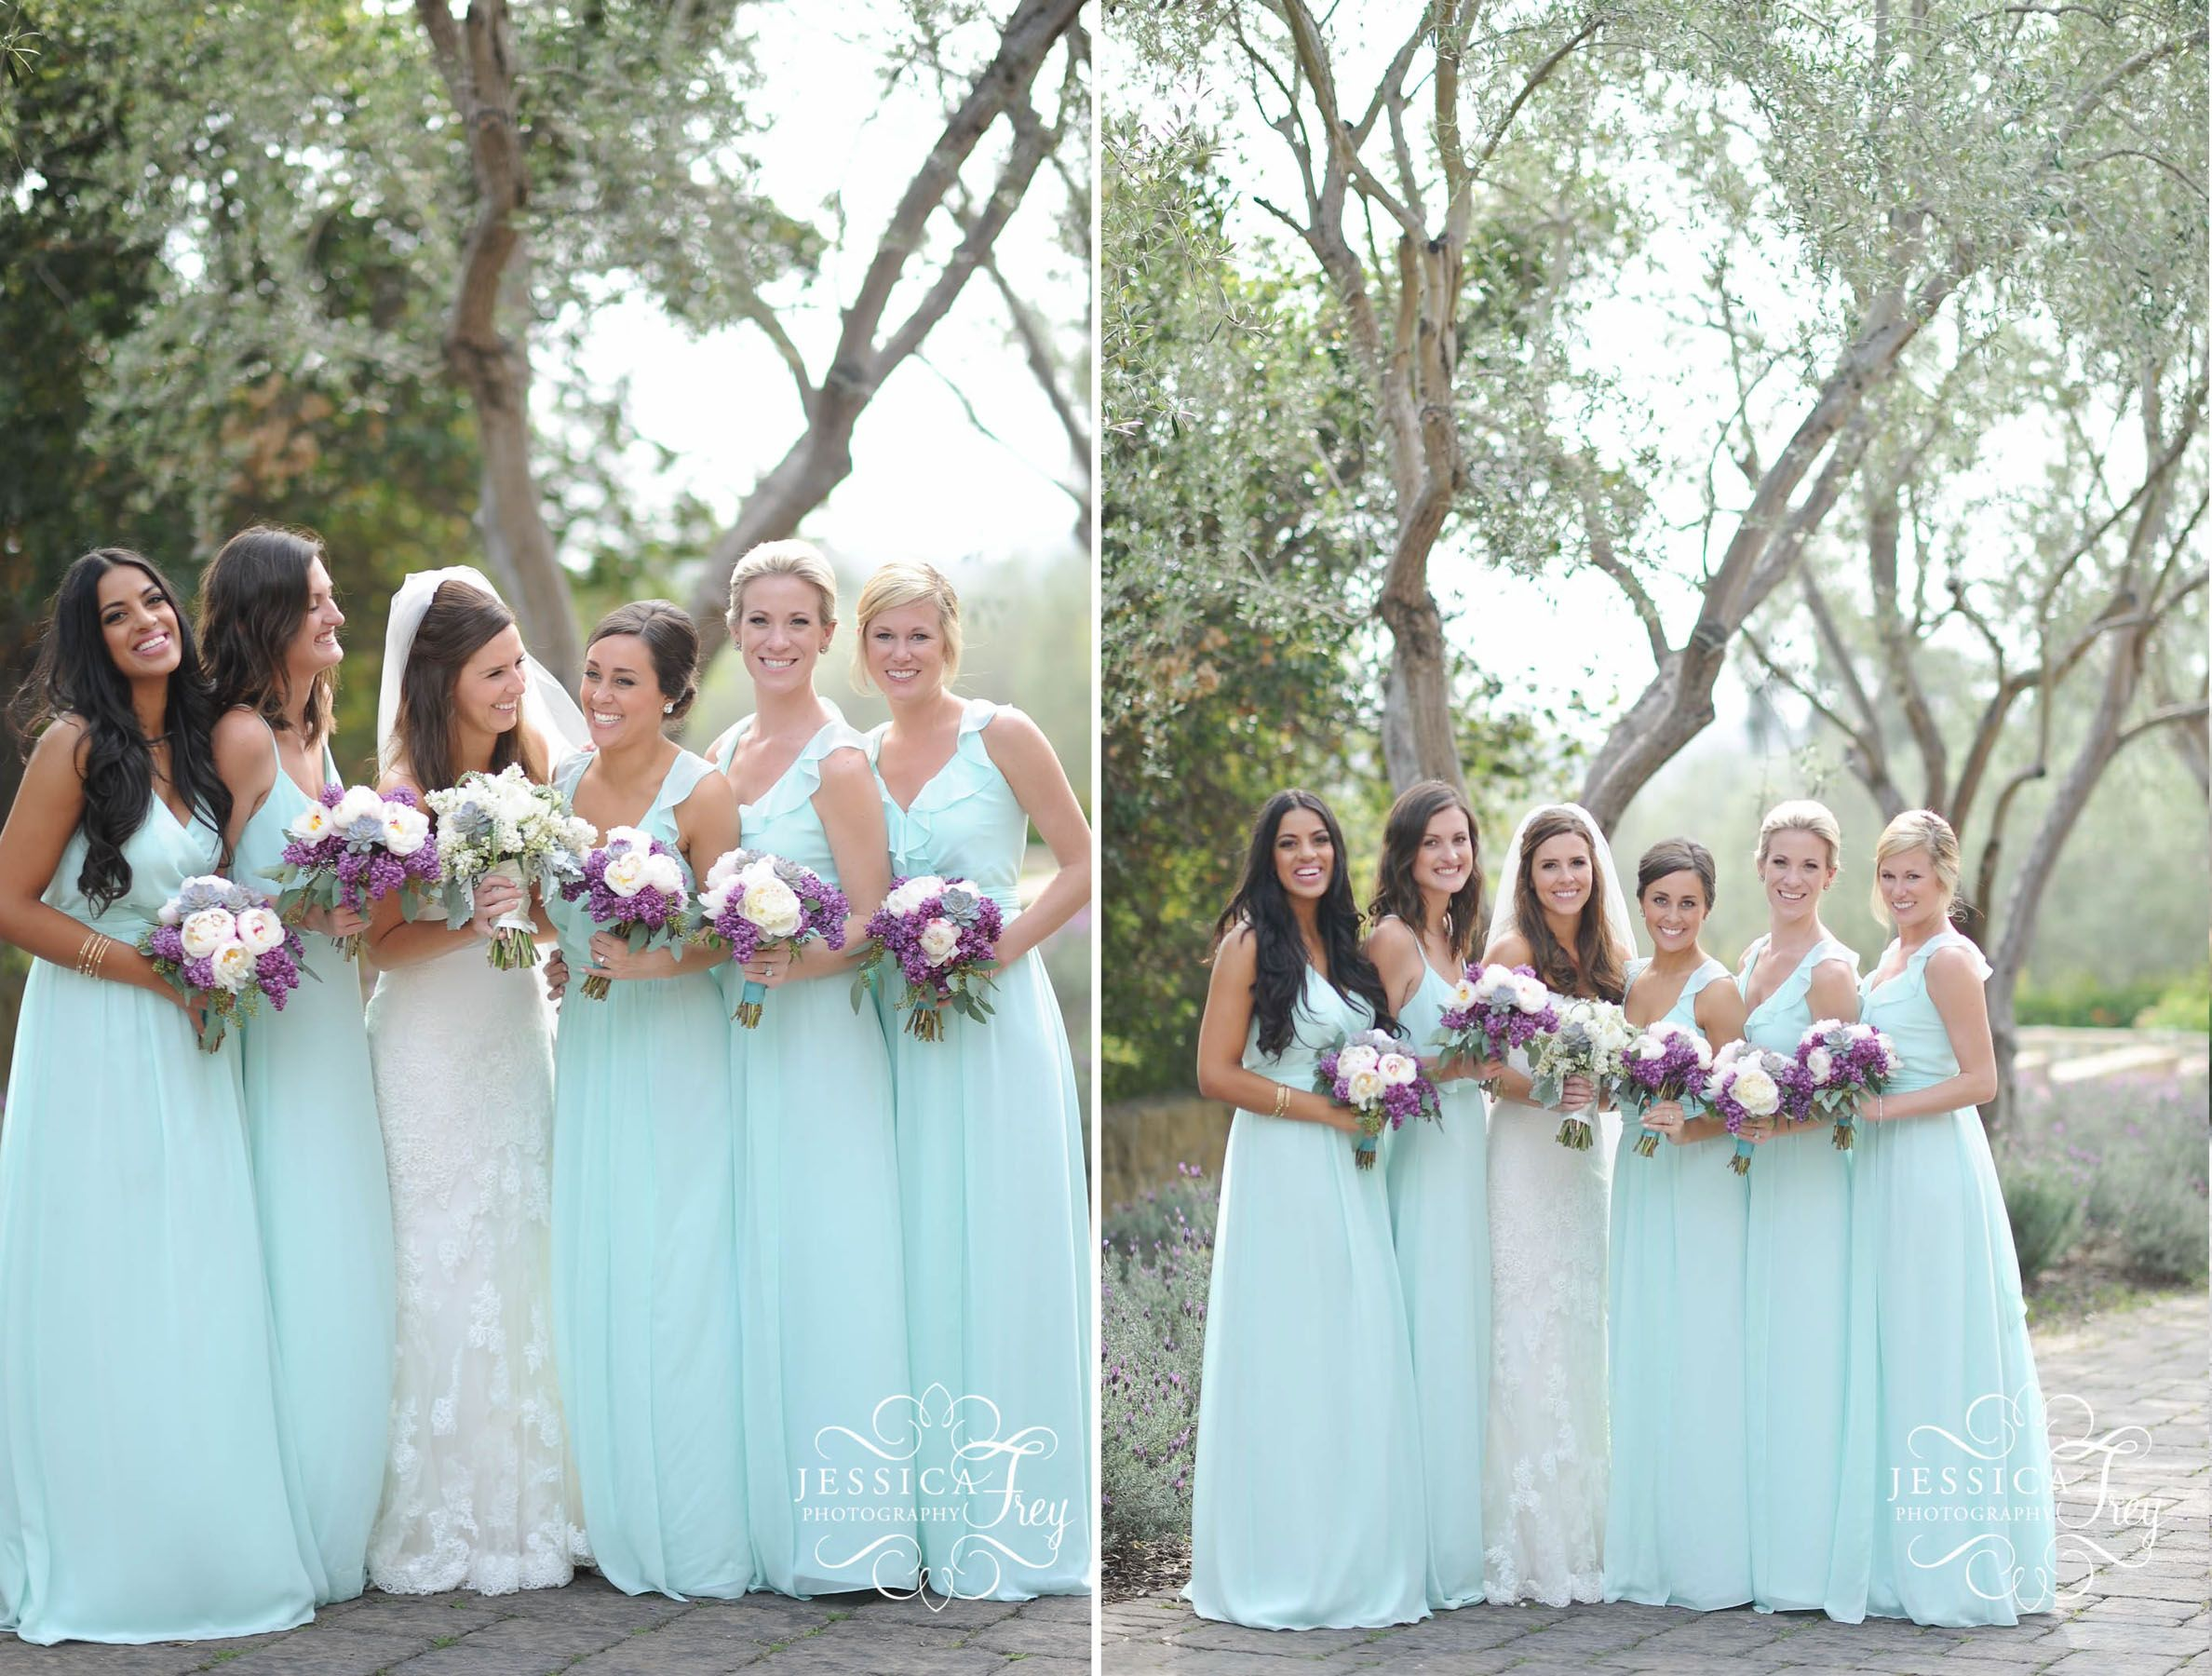 Jessica Frey Photography, Santa Barbara Wedding, Joanna August ...